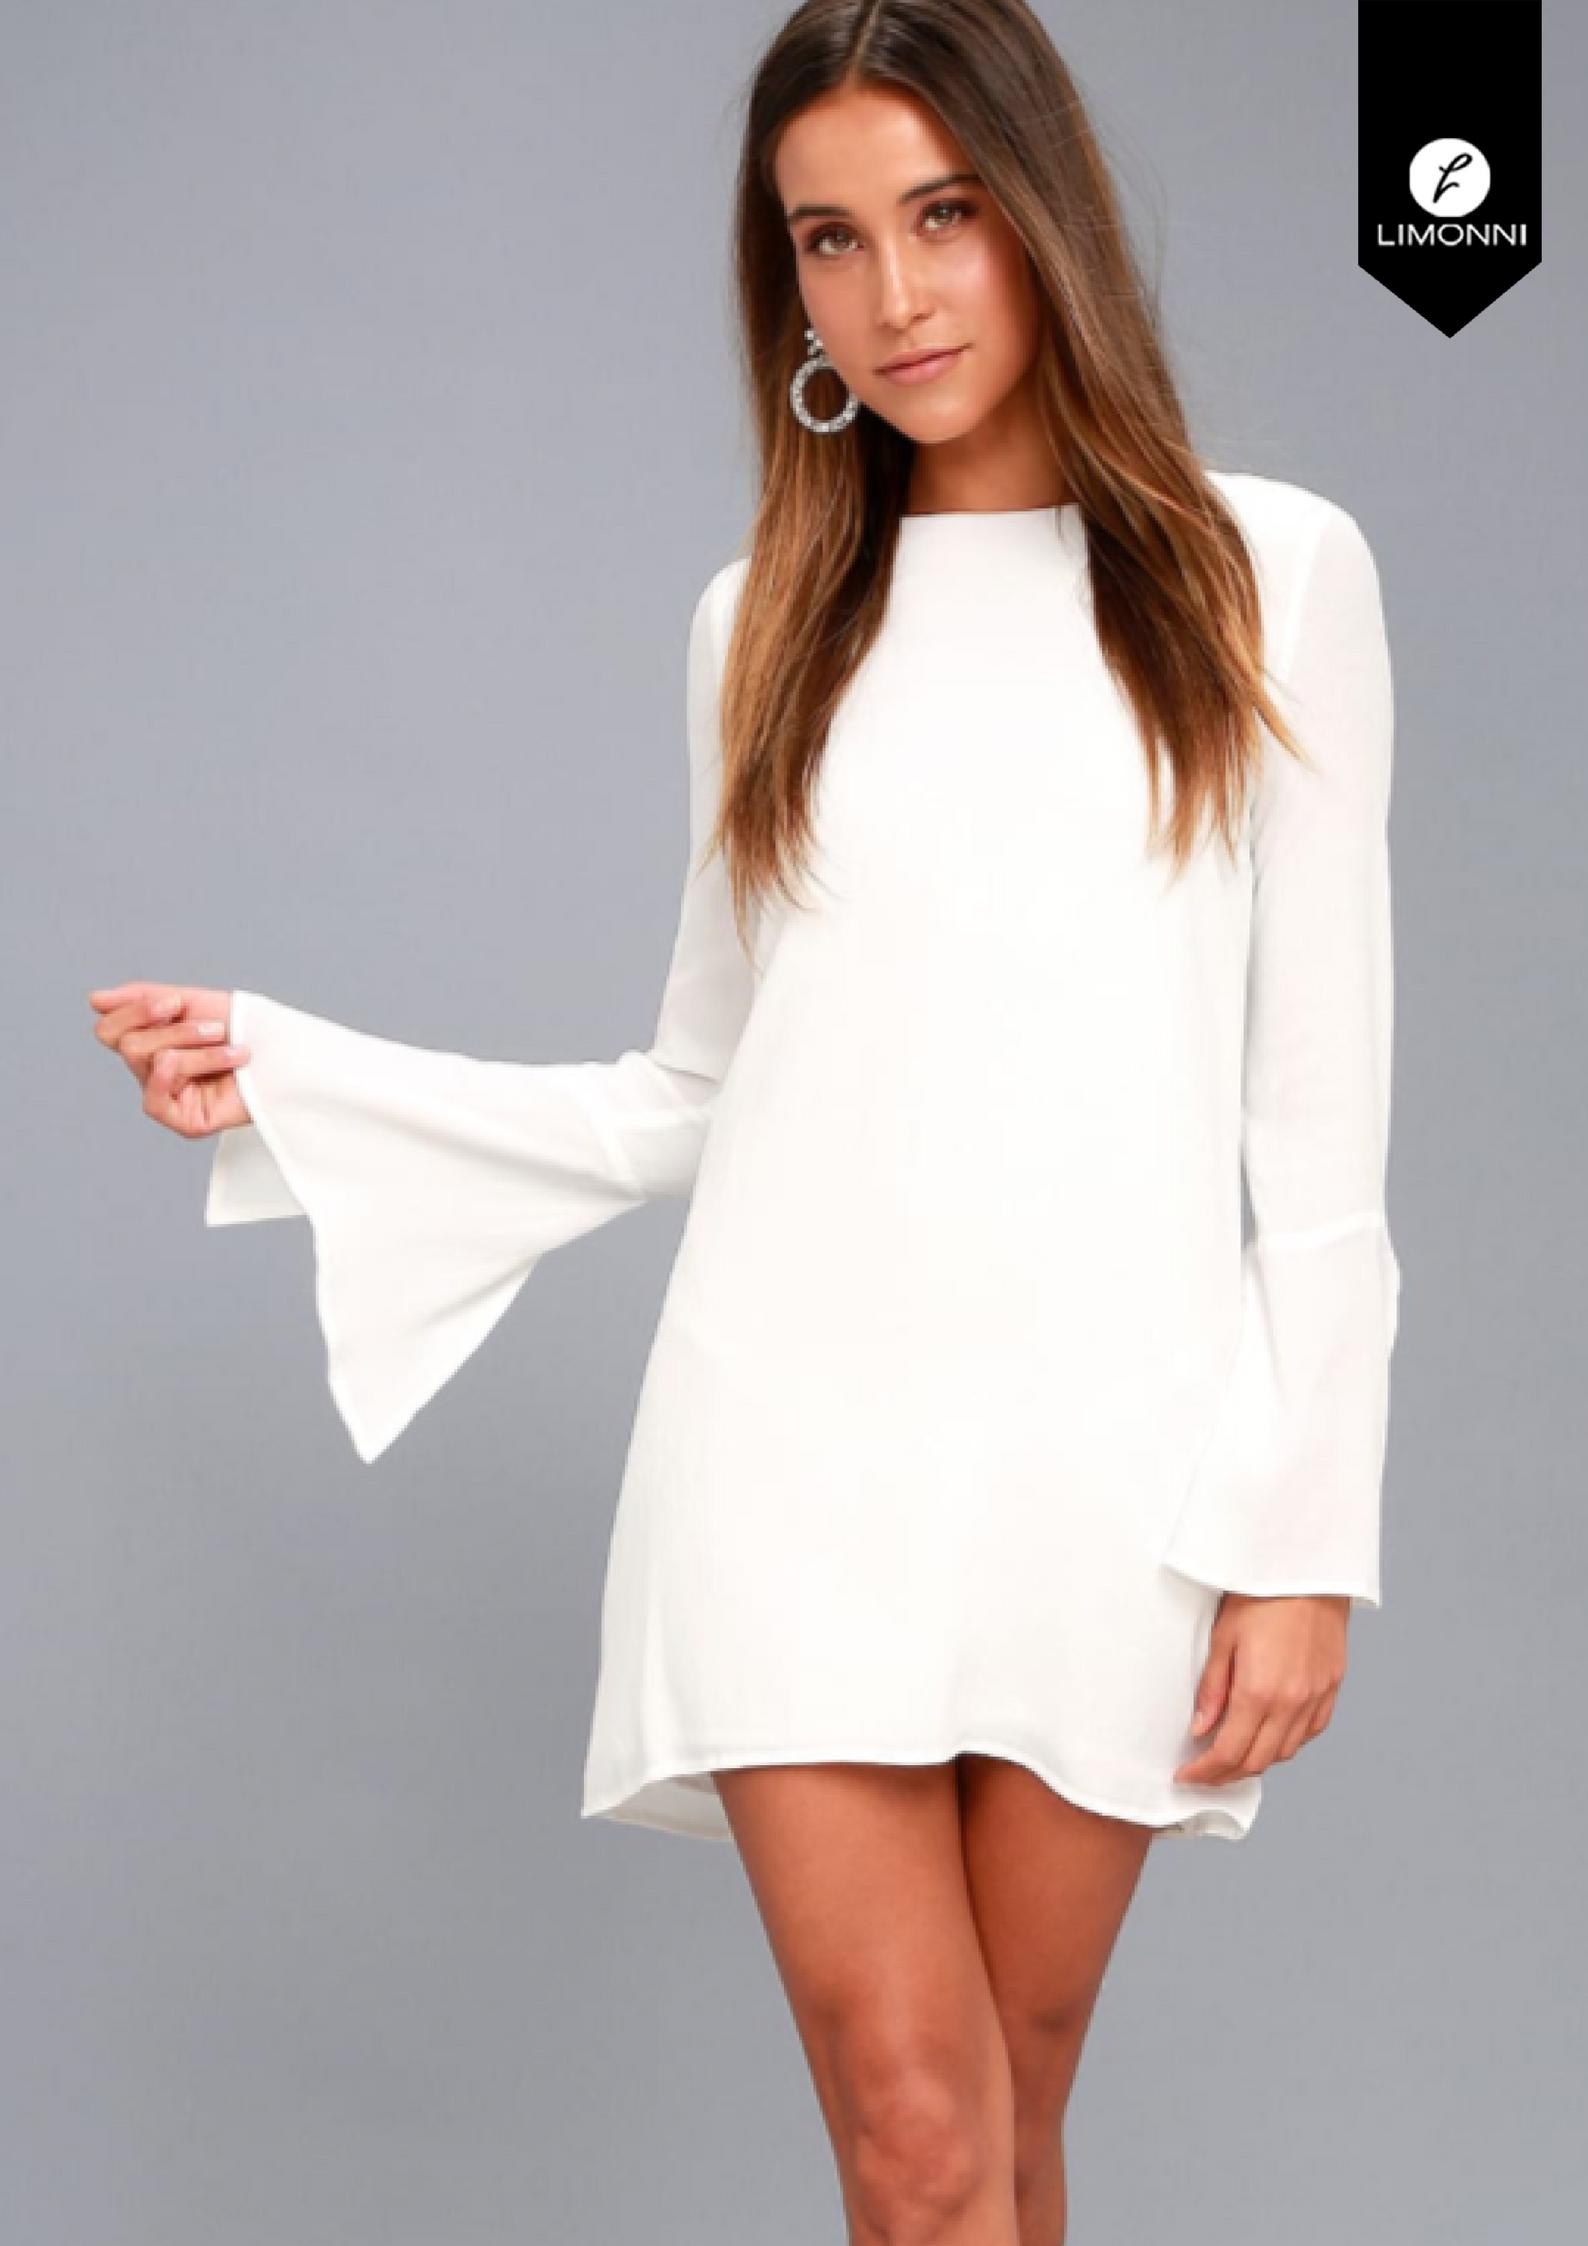 Vestidos para mujer Limonni Novalee LI1456 Cortos elegantes